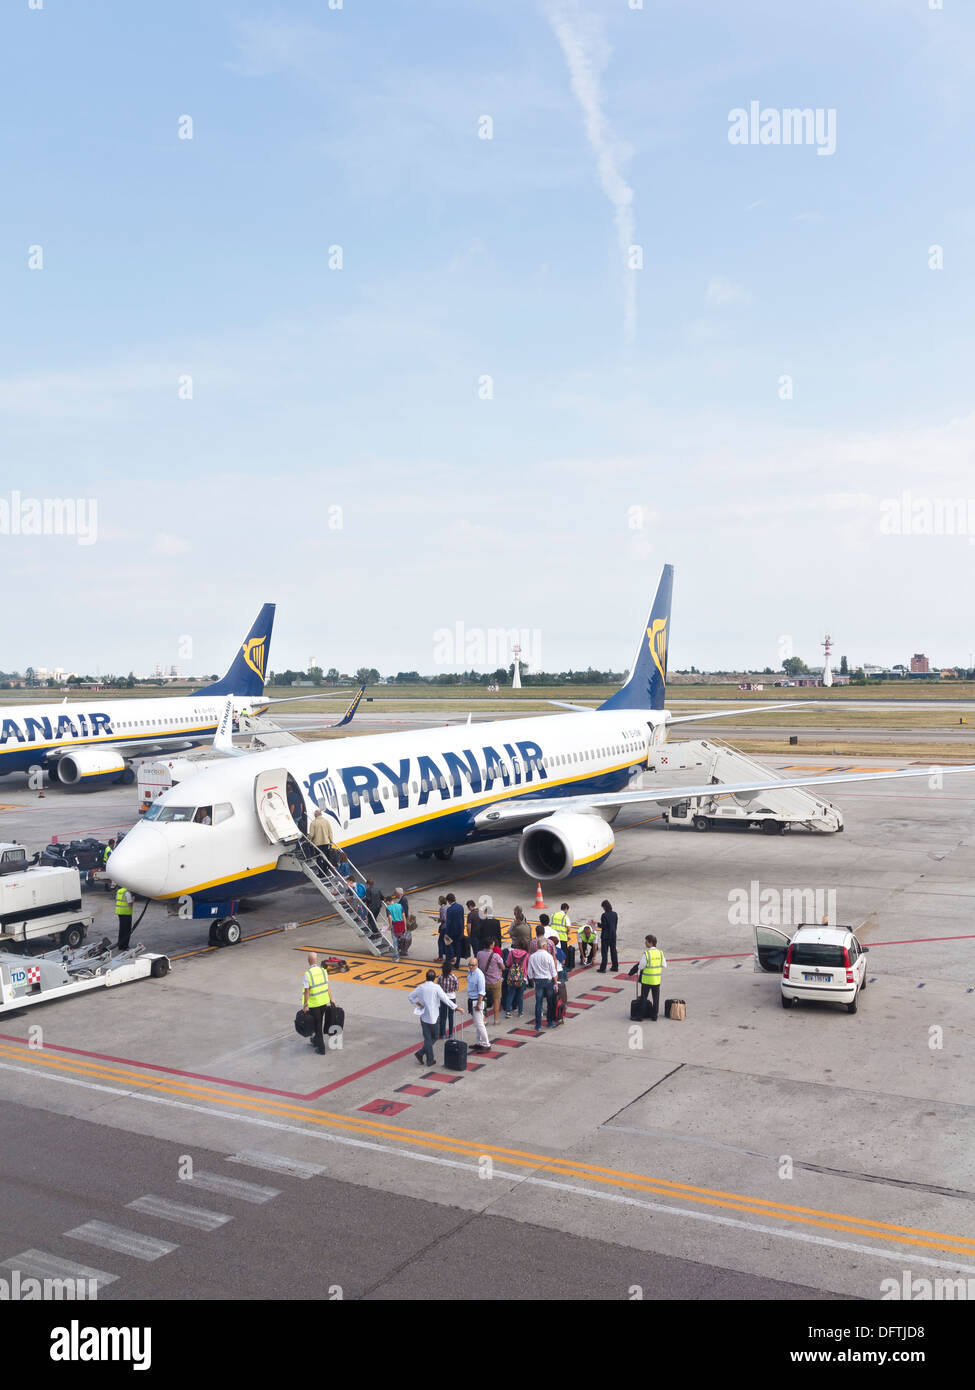 Passengers boarding a Ryanair flight, Bologna airport, Italy - Stock Image